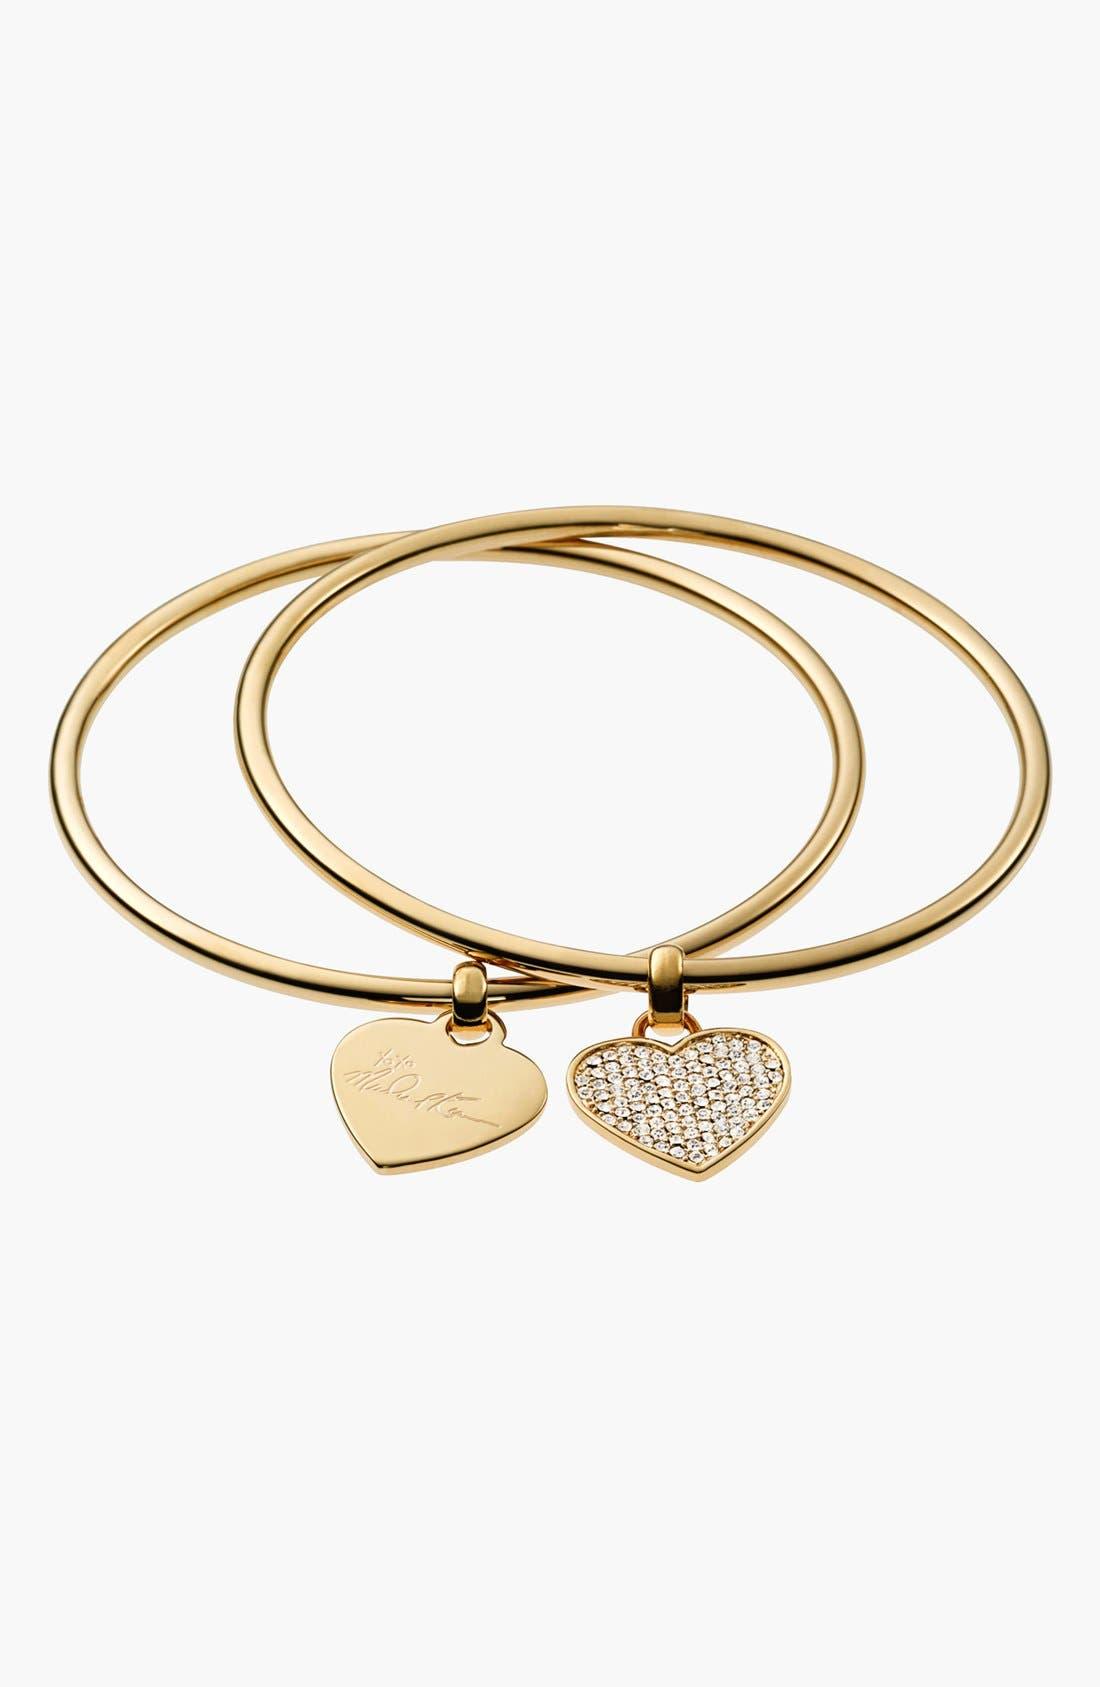 Alternate Image 1 Selected - Michael Kors Boxed Heart Charm Bangles (Set of 2)